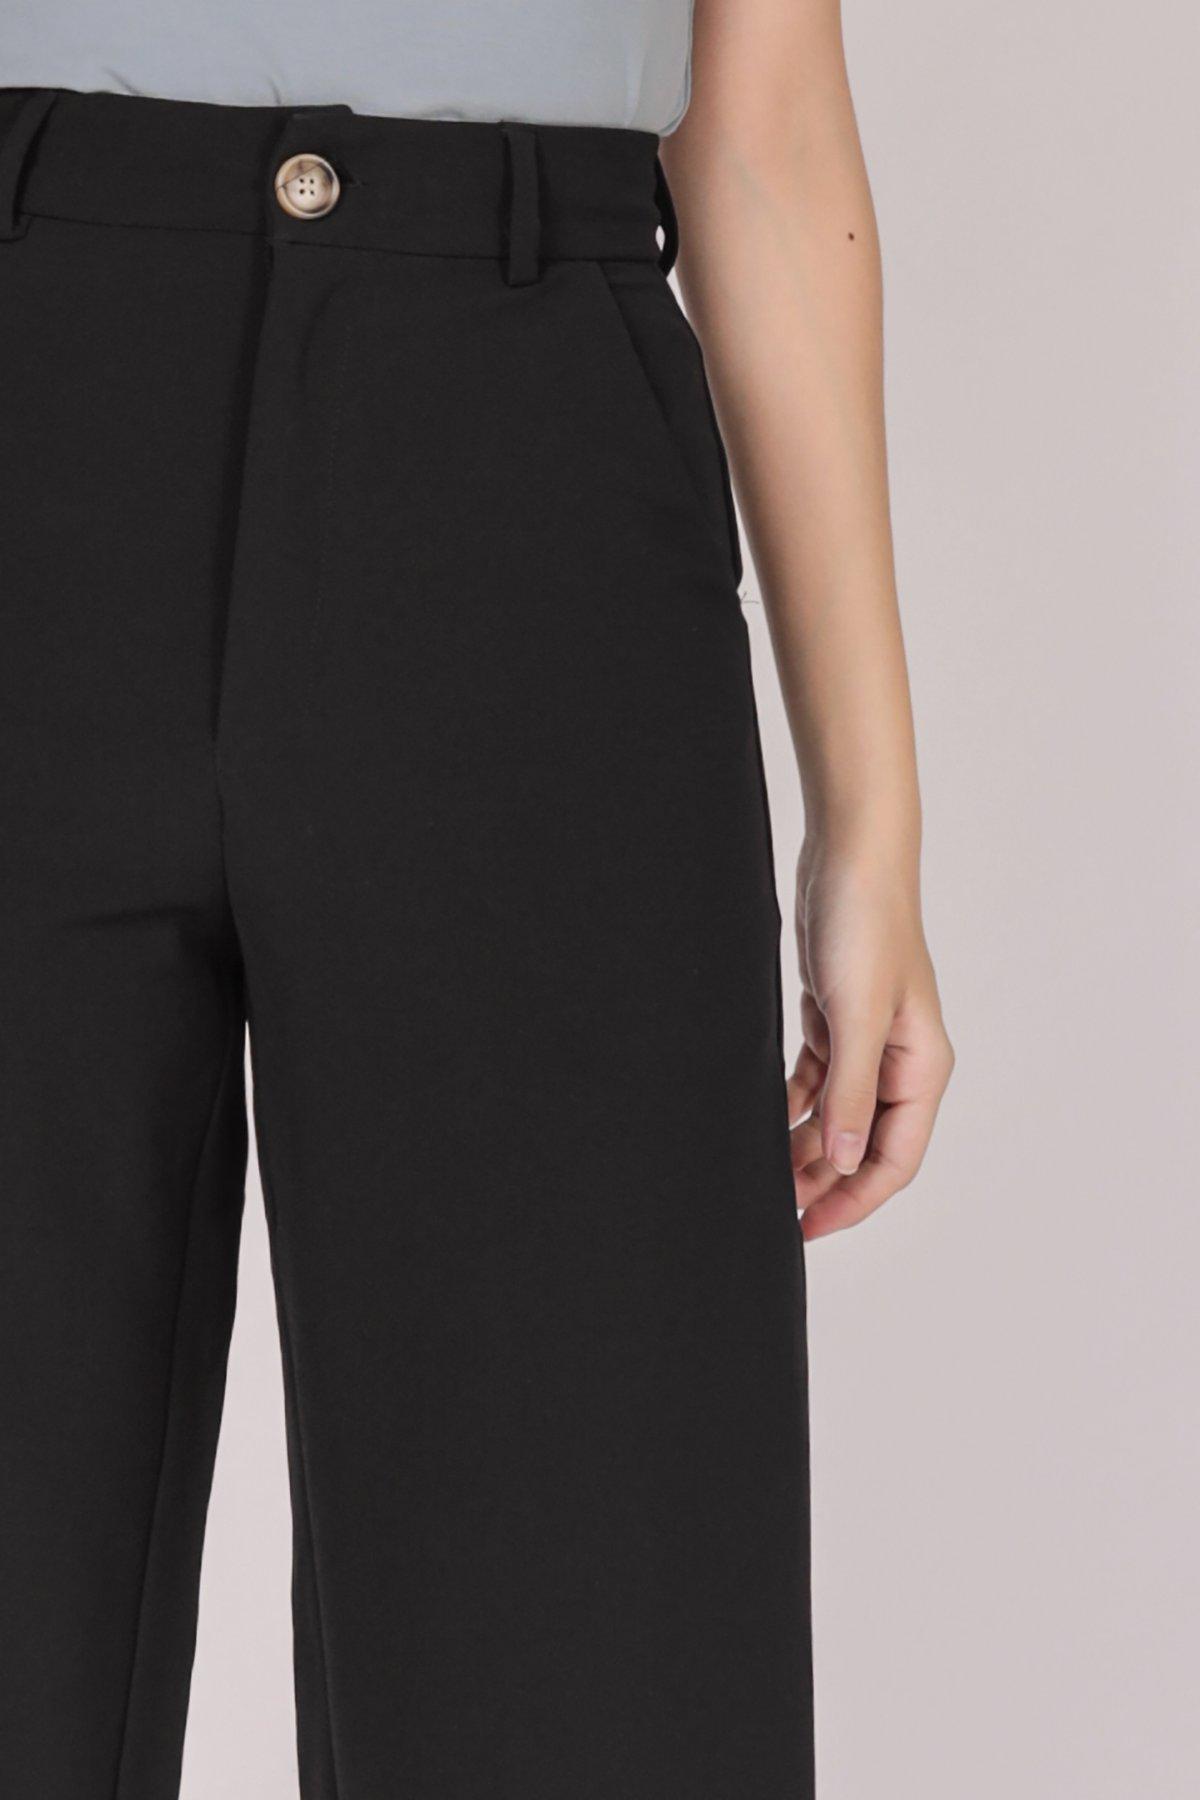 Baxter Cuffed Pants (Black)